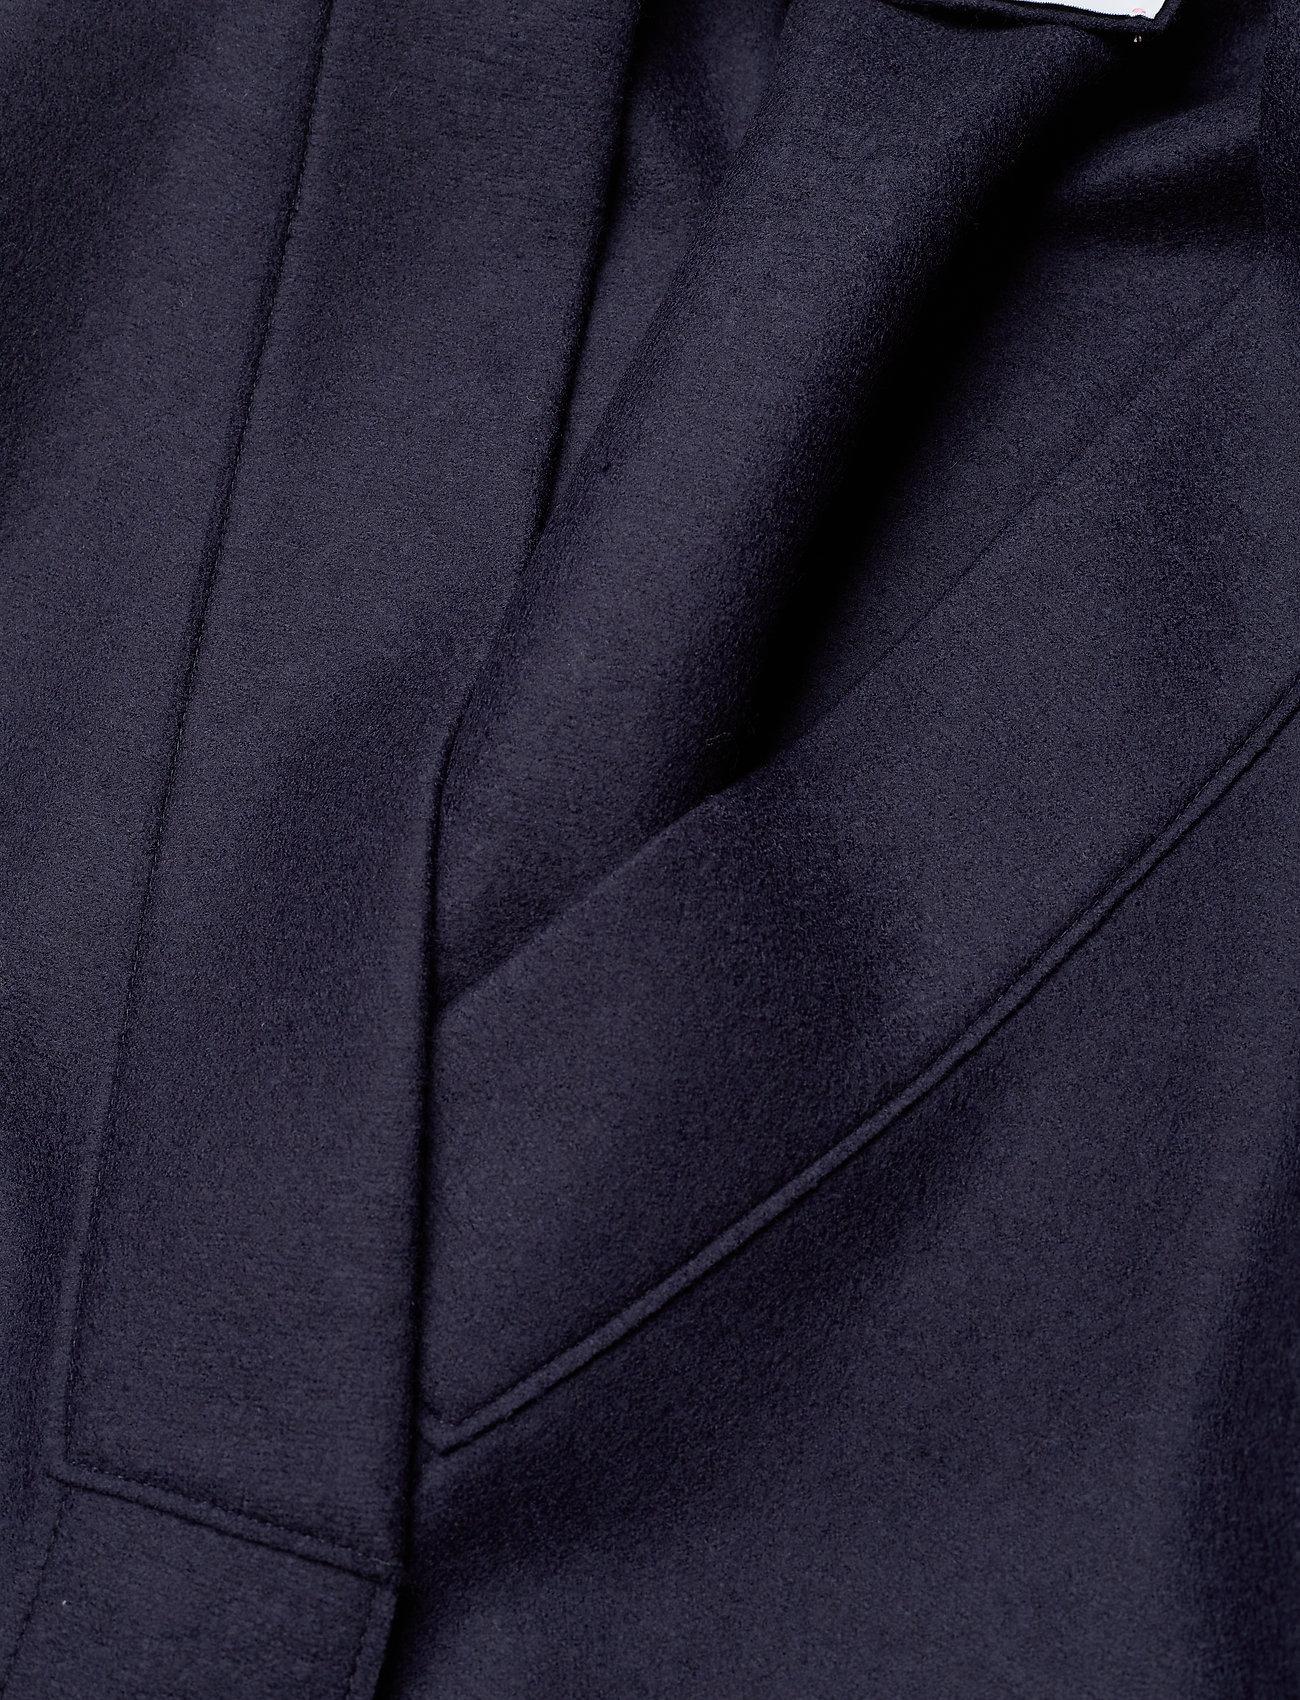 Harris Wharf London - Women Kimono Coat With Vents Light Pressed Wool - wollmäntel - navy blue - 2